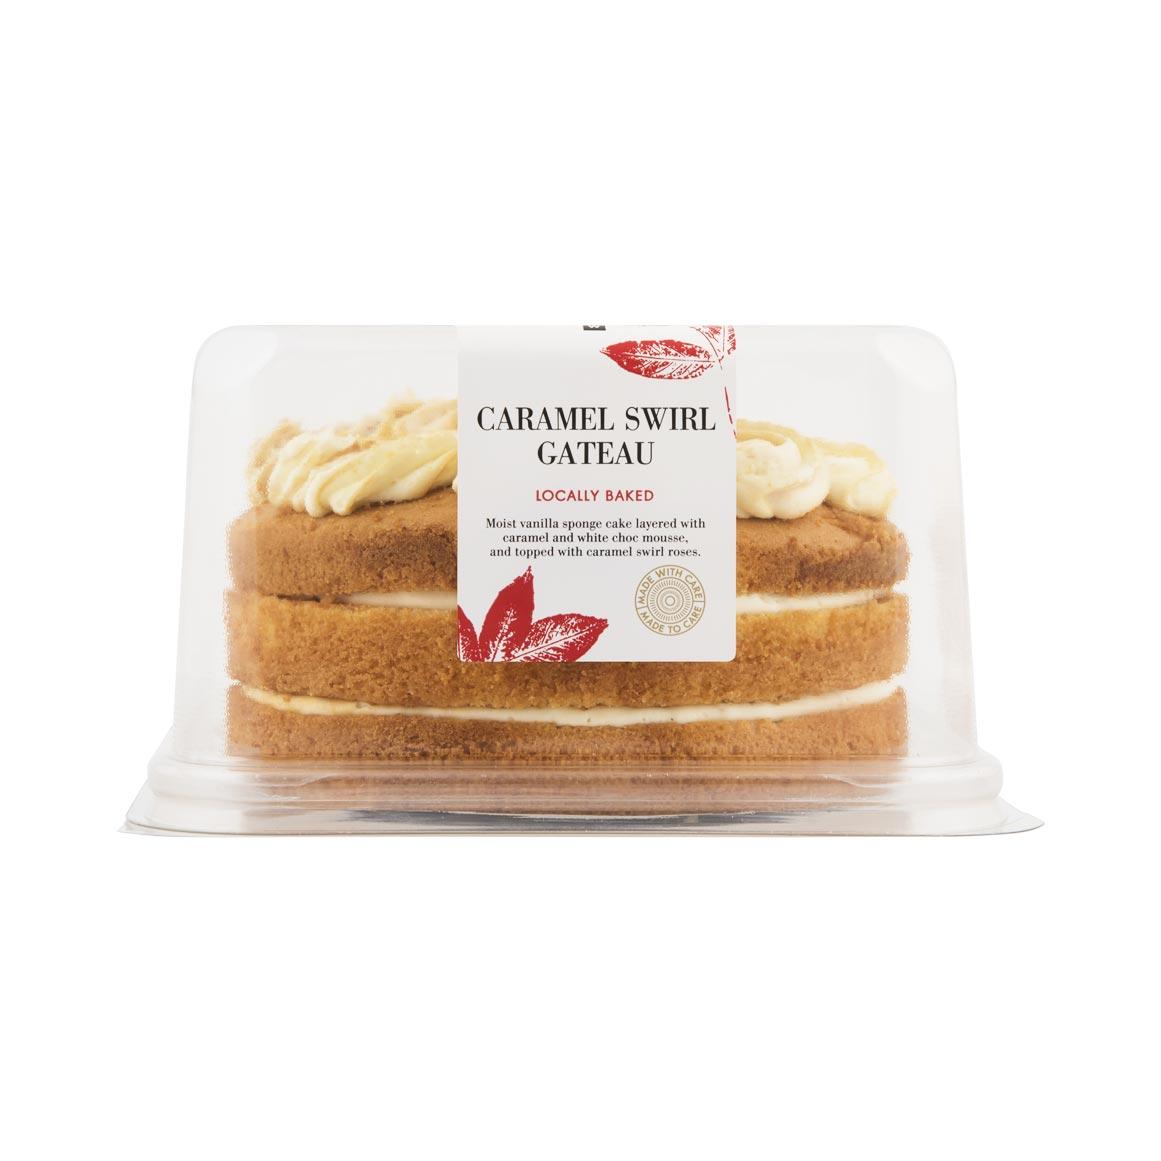 cc20037039 Caramel Swirl Gateau Cake 1Kg